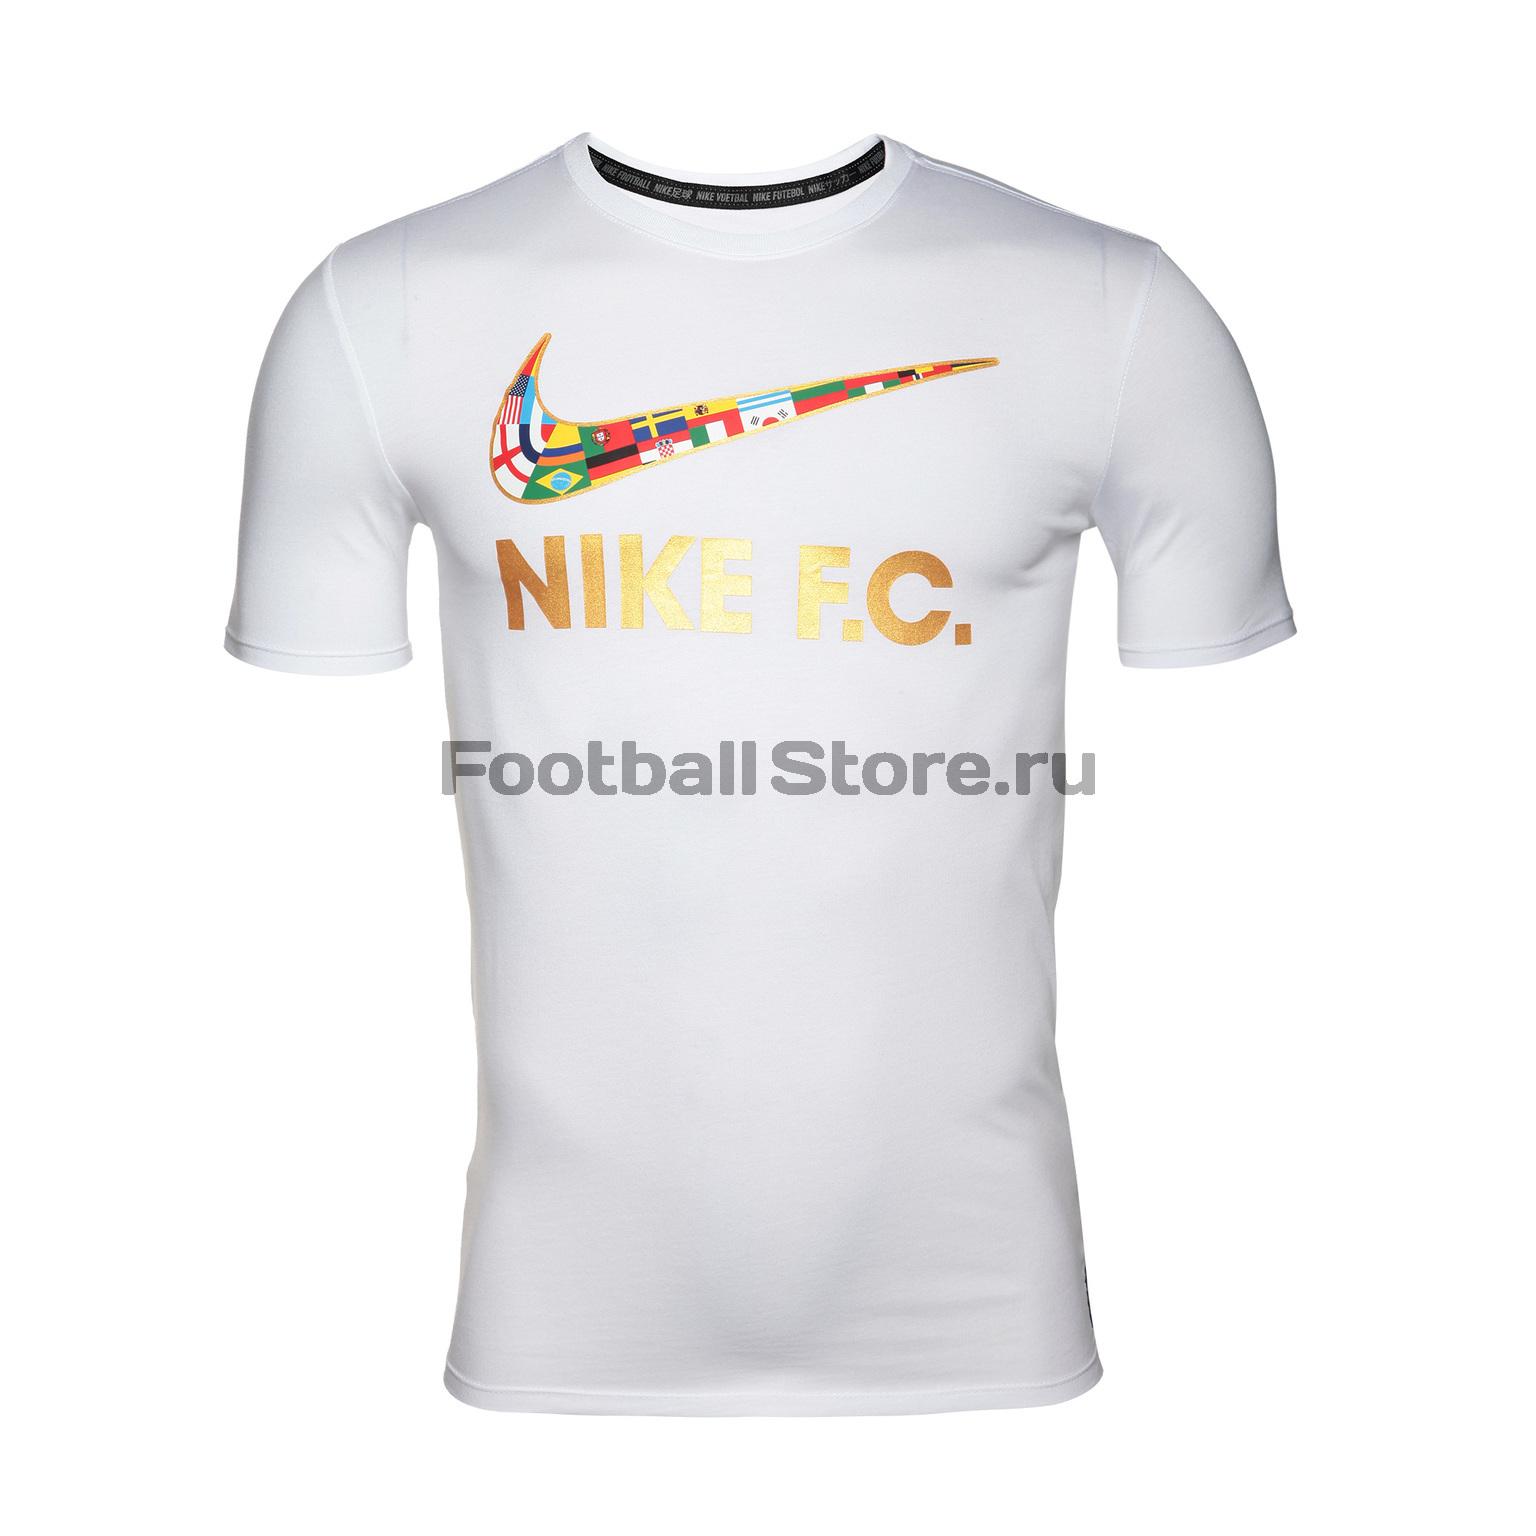 Футболка Nike FC Tee 911400-101 roma nike футболка nike roma tee crest 888804 613